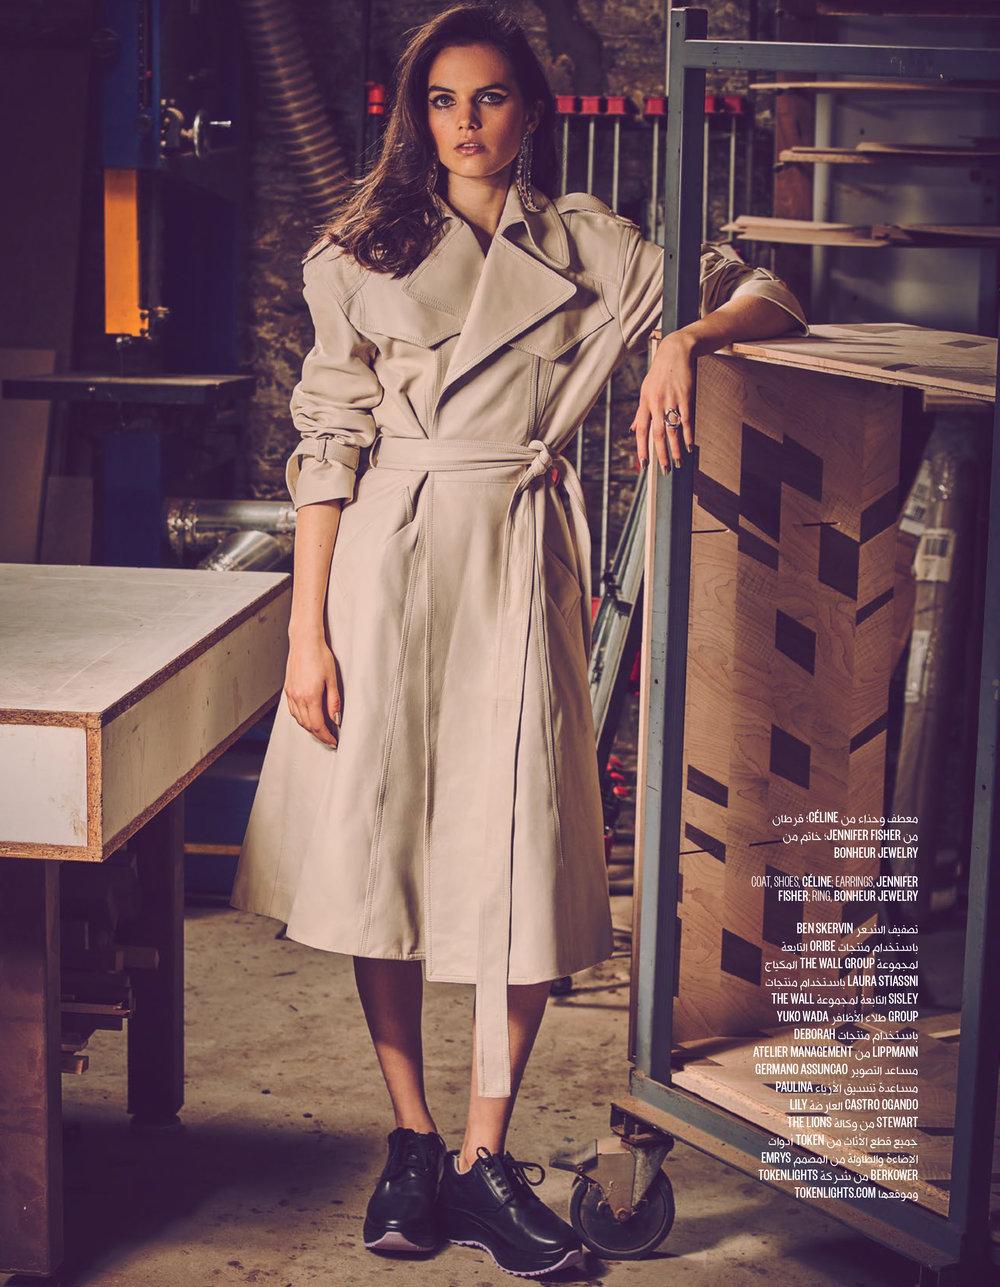 Vogue Arabia March 18 Final Binder_Magzter (dragged) 3-1.jpg